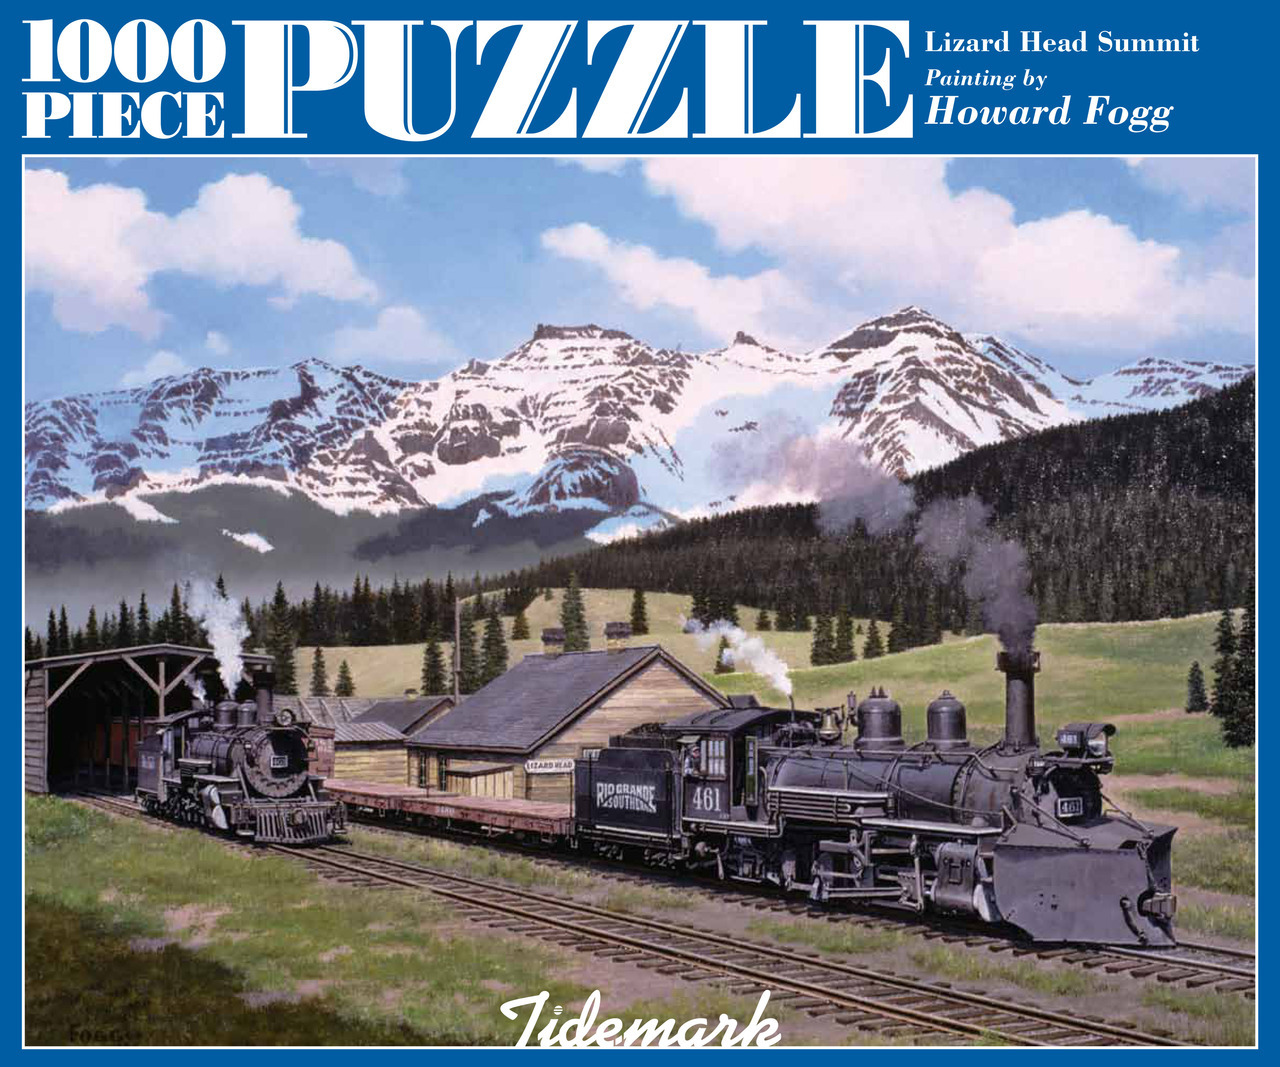 Lizard Head Summit 1,000 Piece Rio Grande Railroad Jigsaw Puzzle carton cover